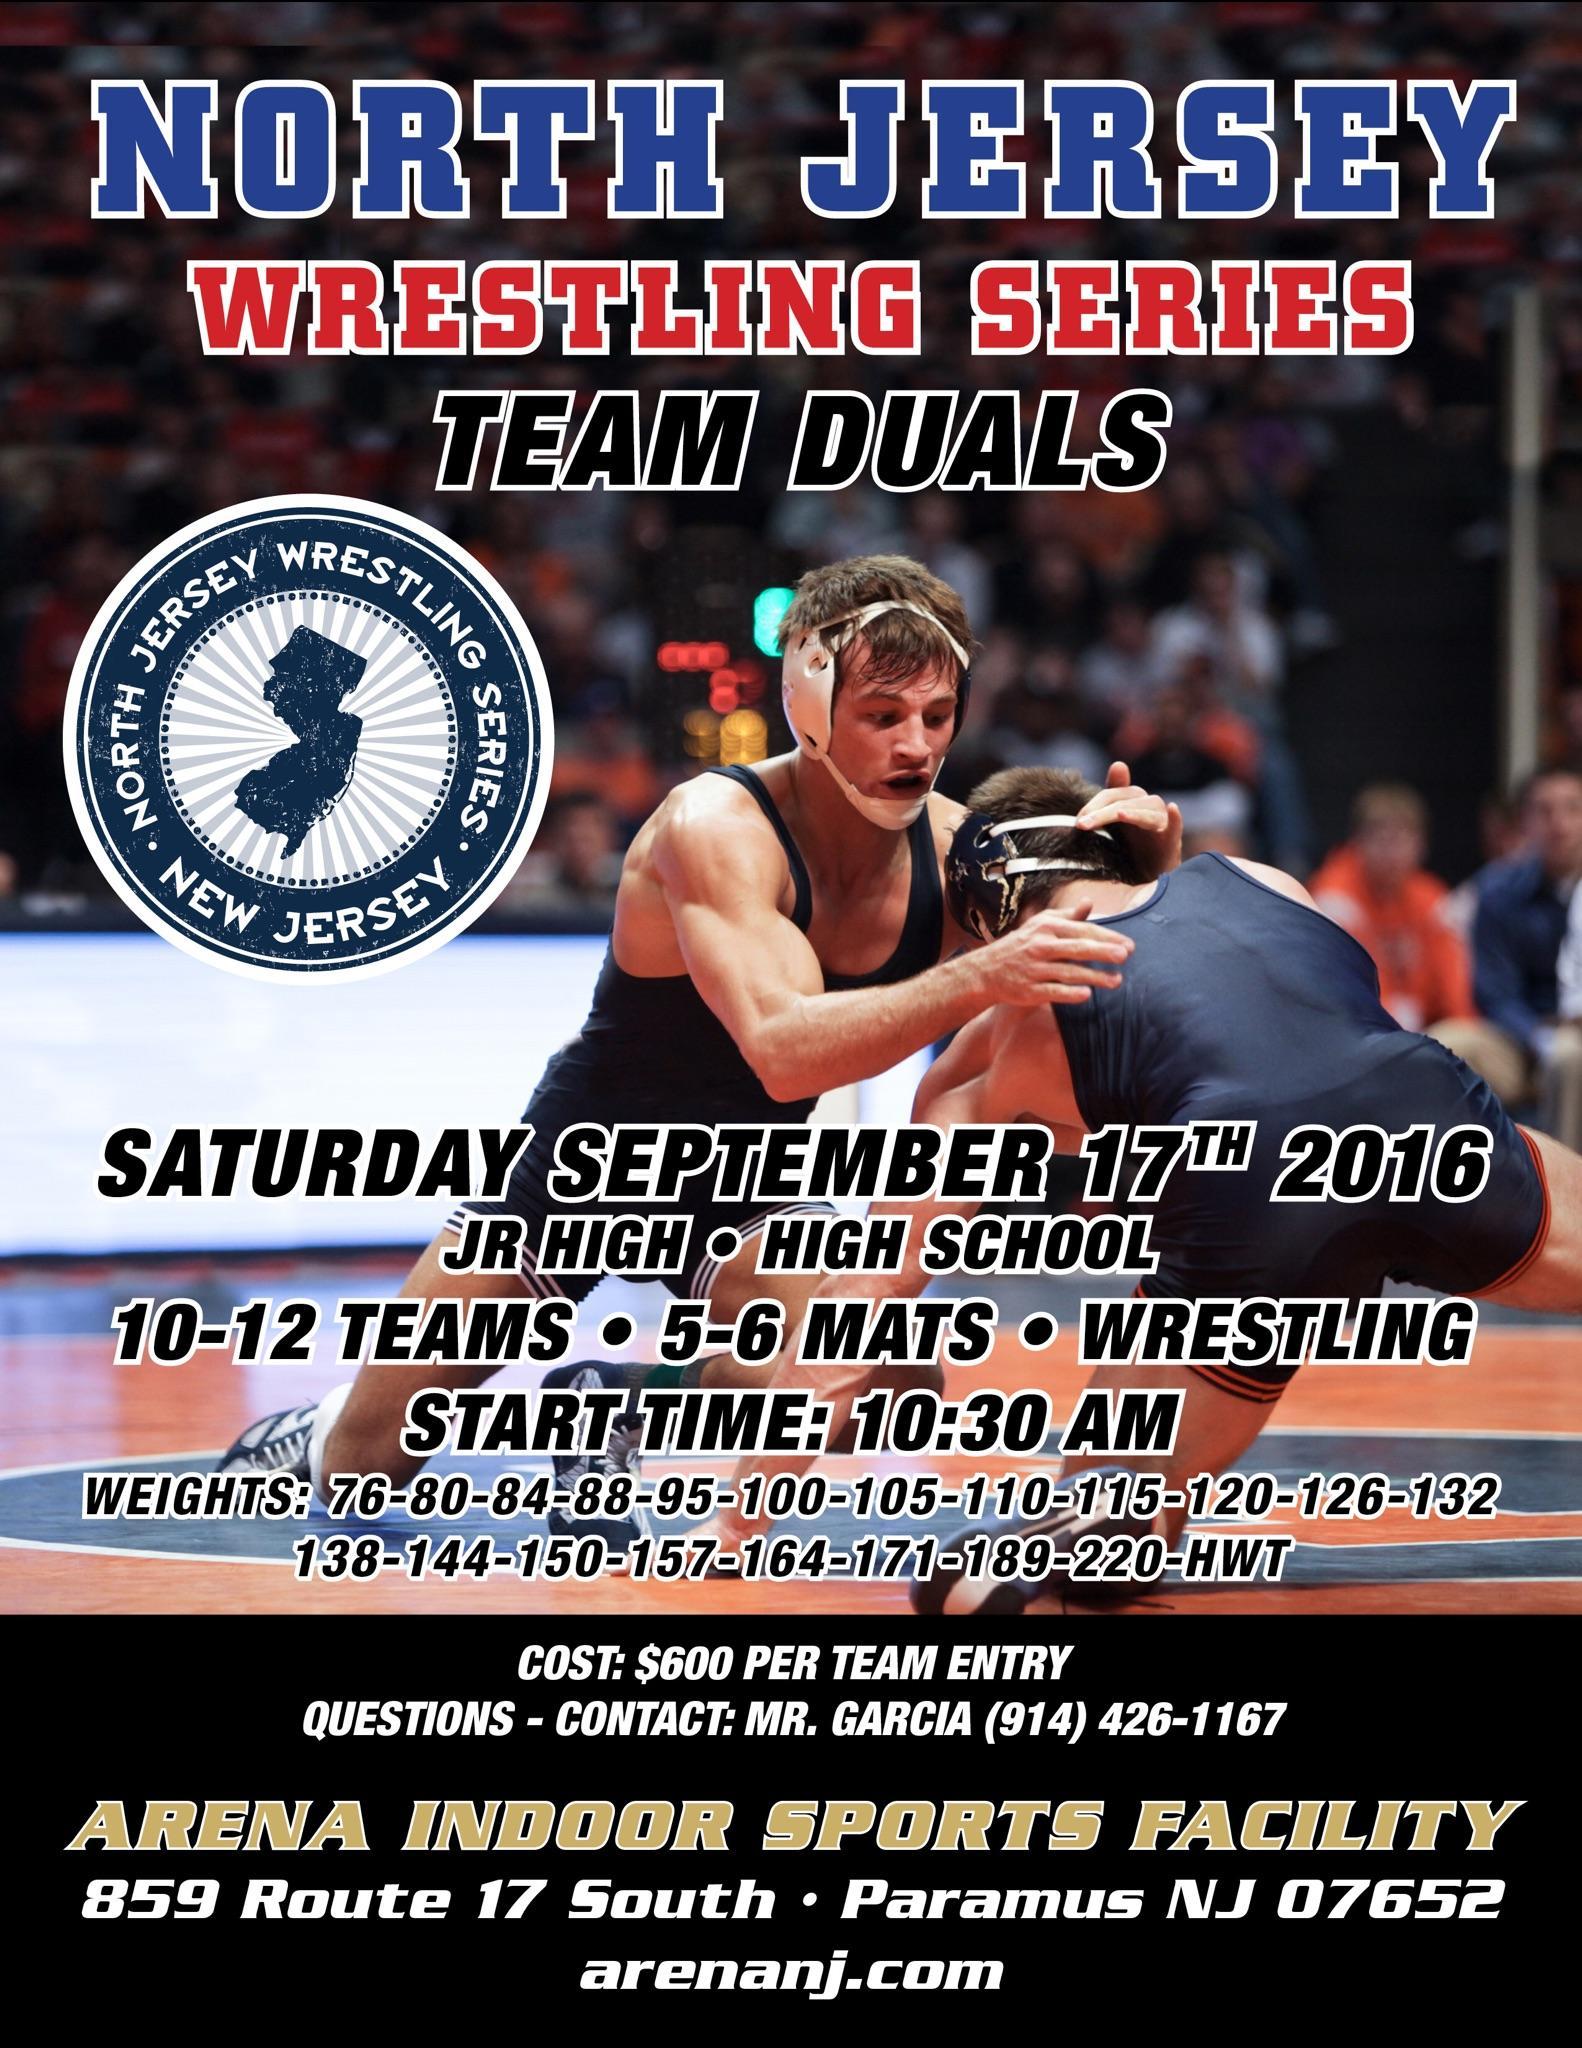 Great Preseason Wrestling Opportunity – SECTION 9 WRESTLING